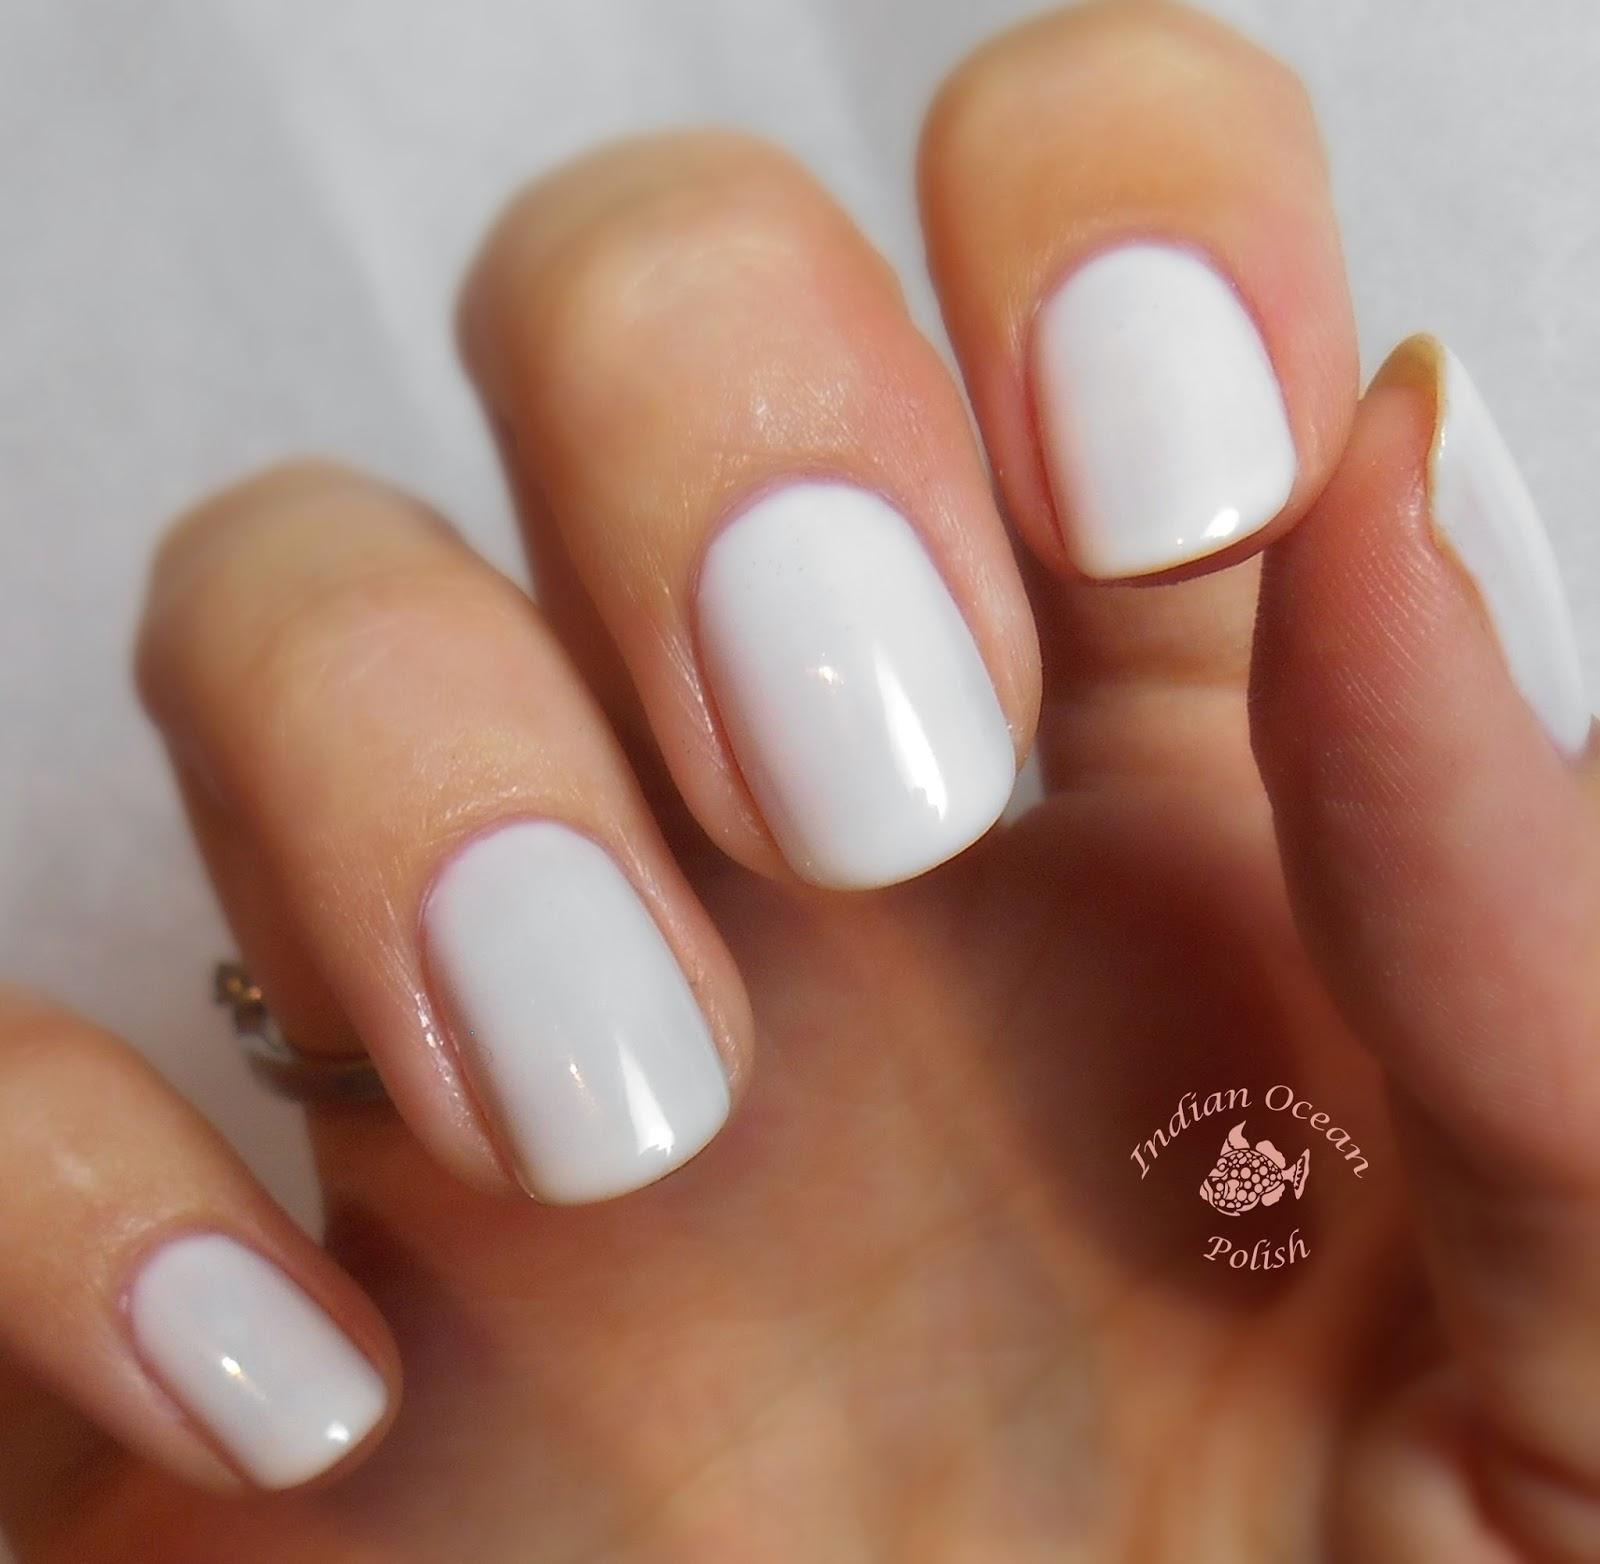 DeCoto Makeup: Funny Bunny Nail Polish - Perfect White ... |Funny Bunny Nails